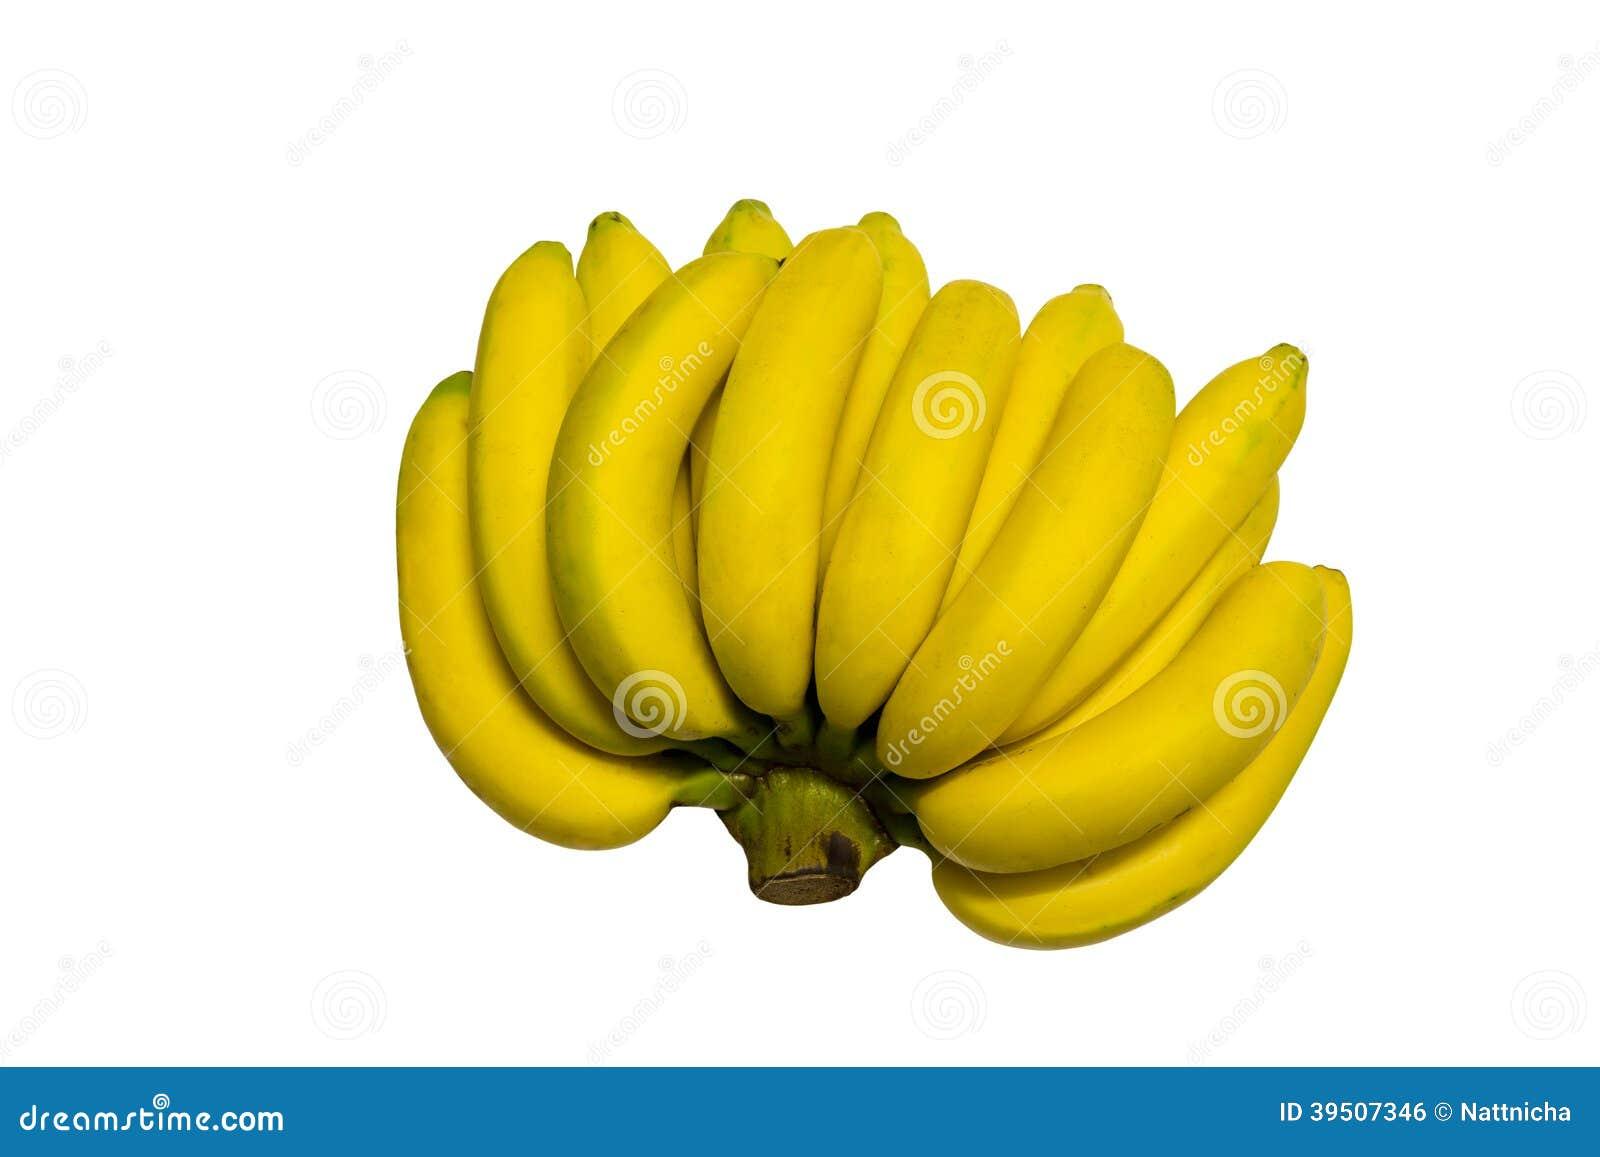 Bananas isolated on white